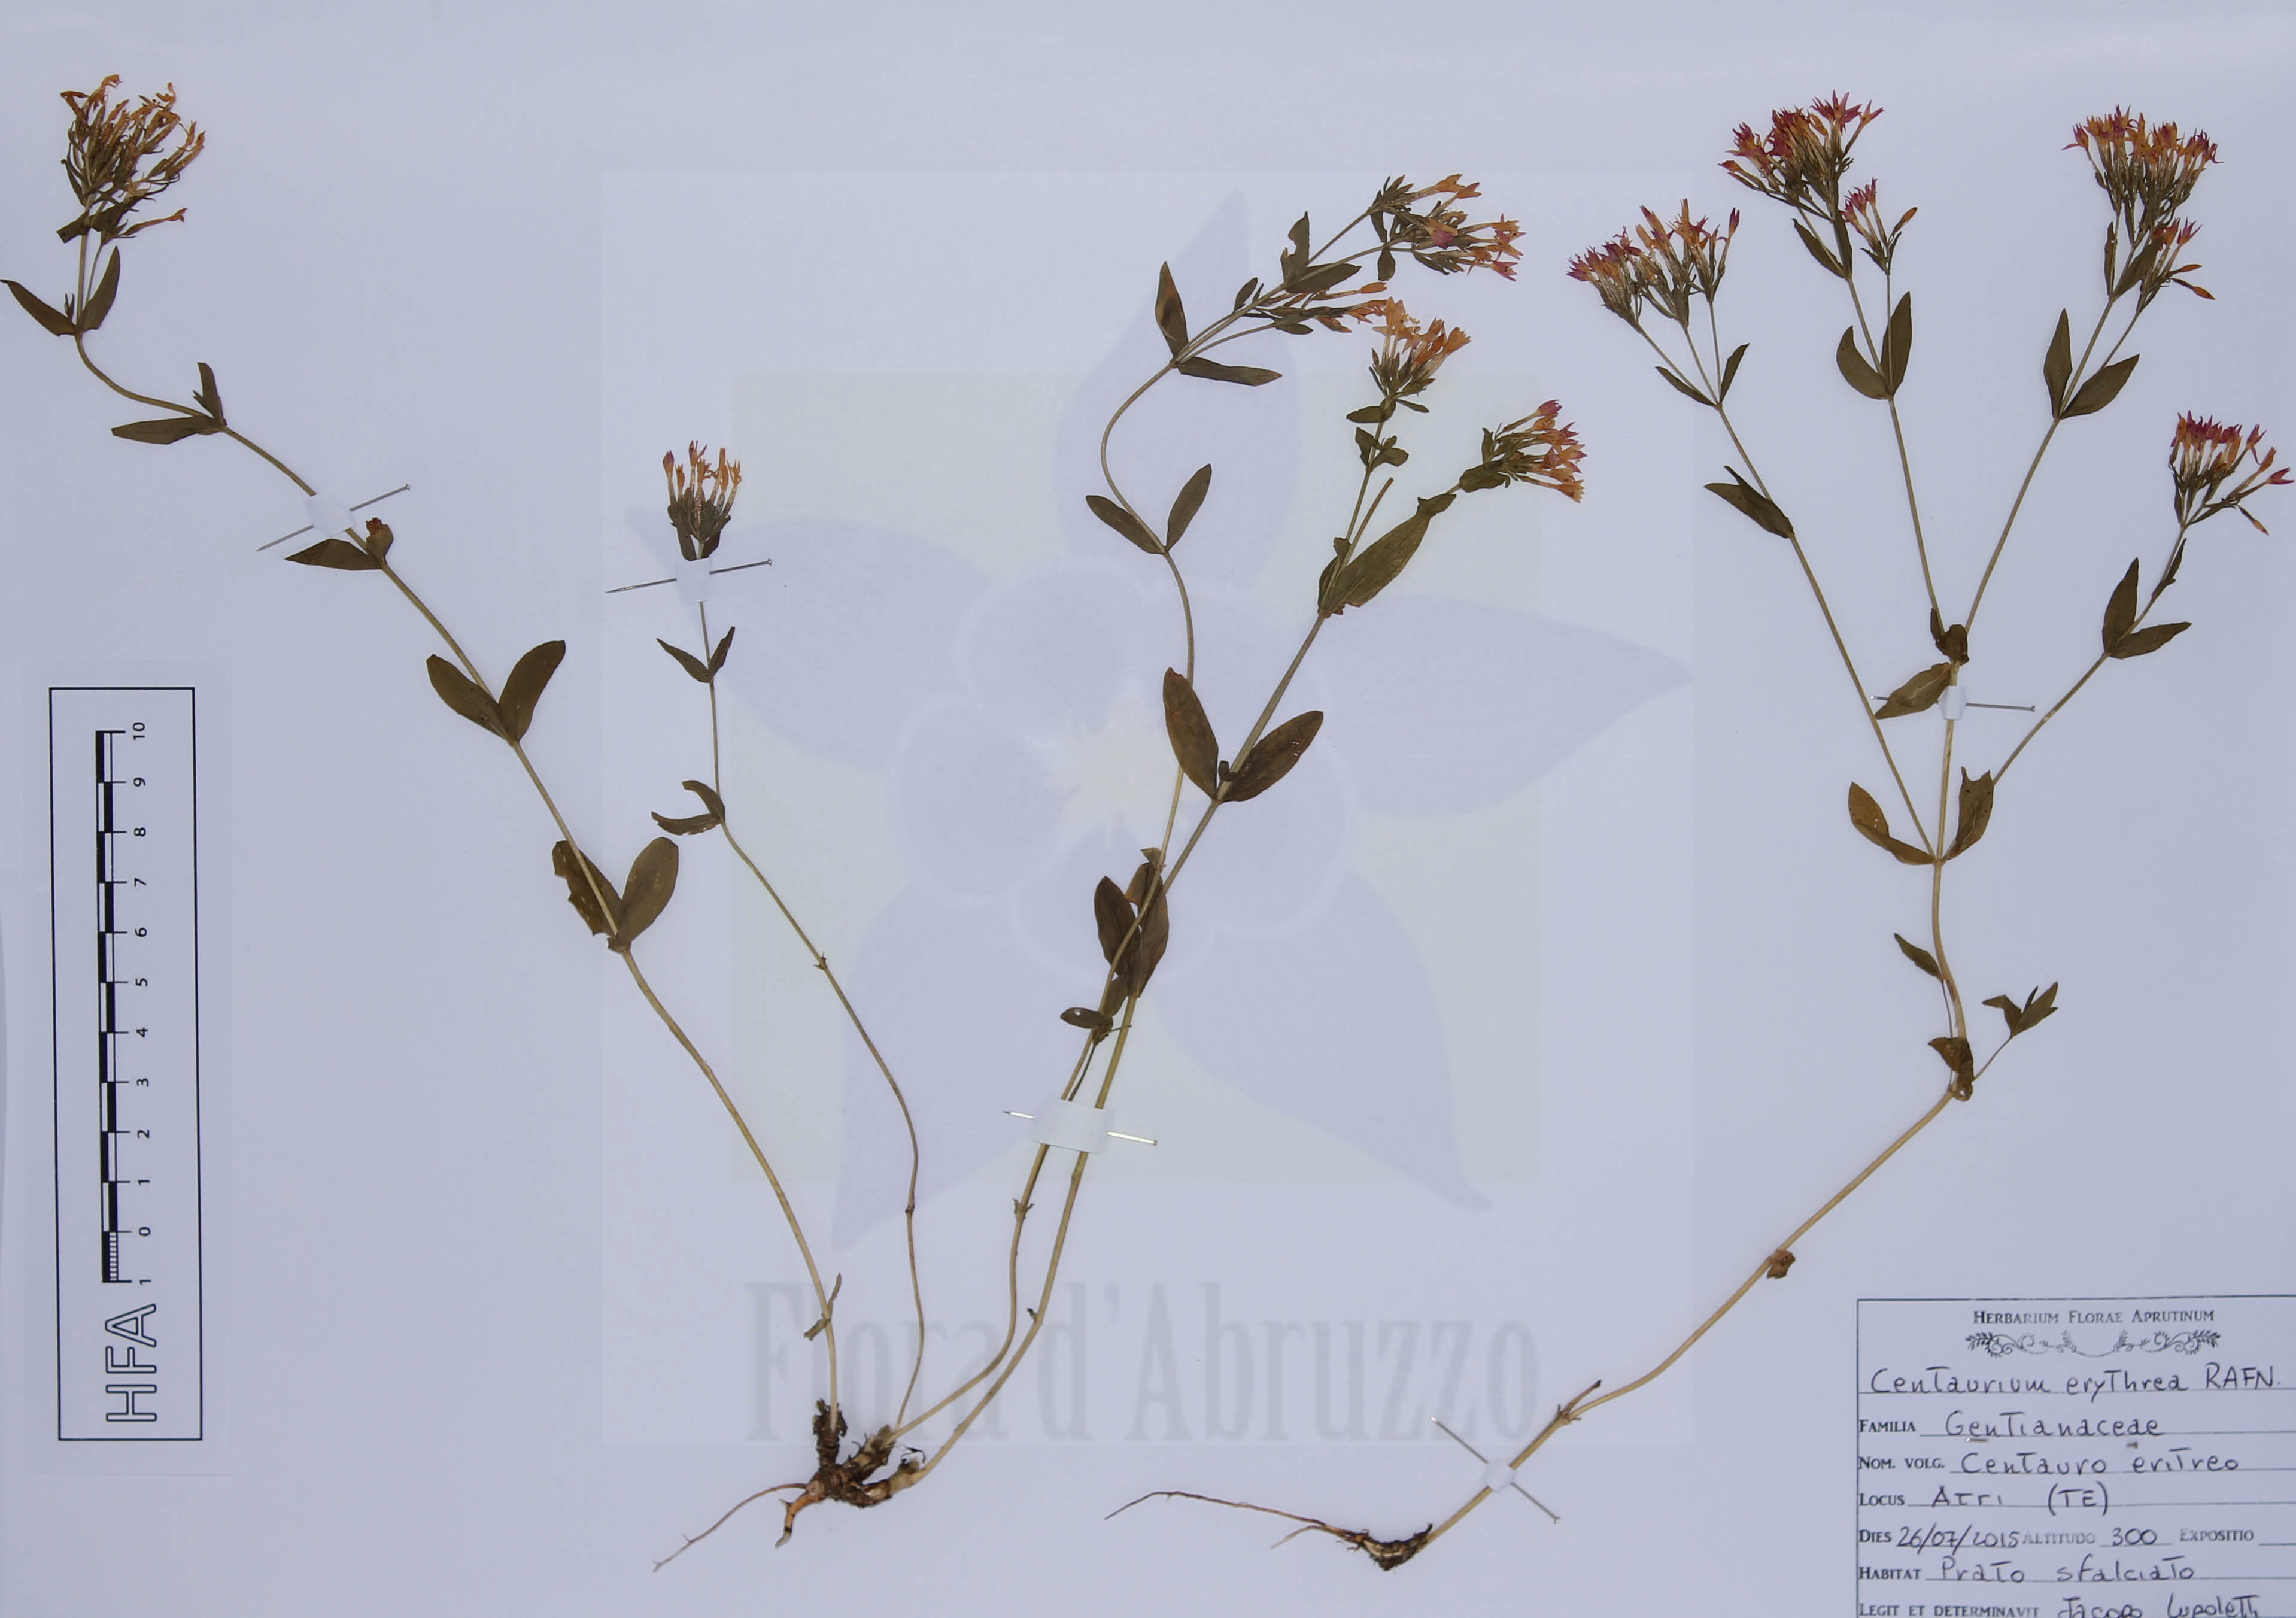 Centaurium erythraeaRafn